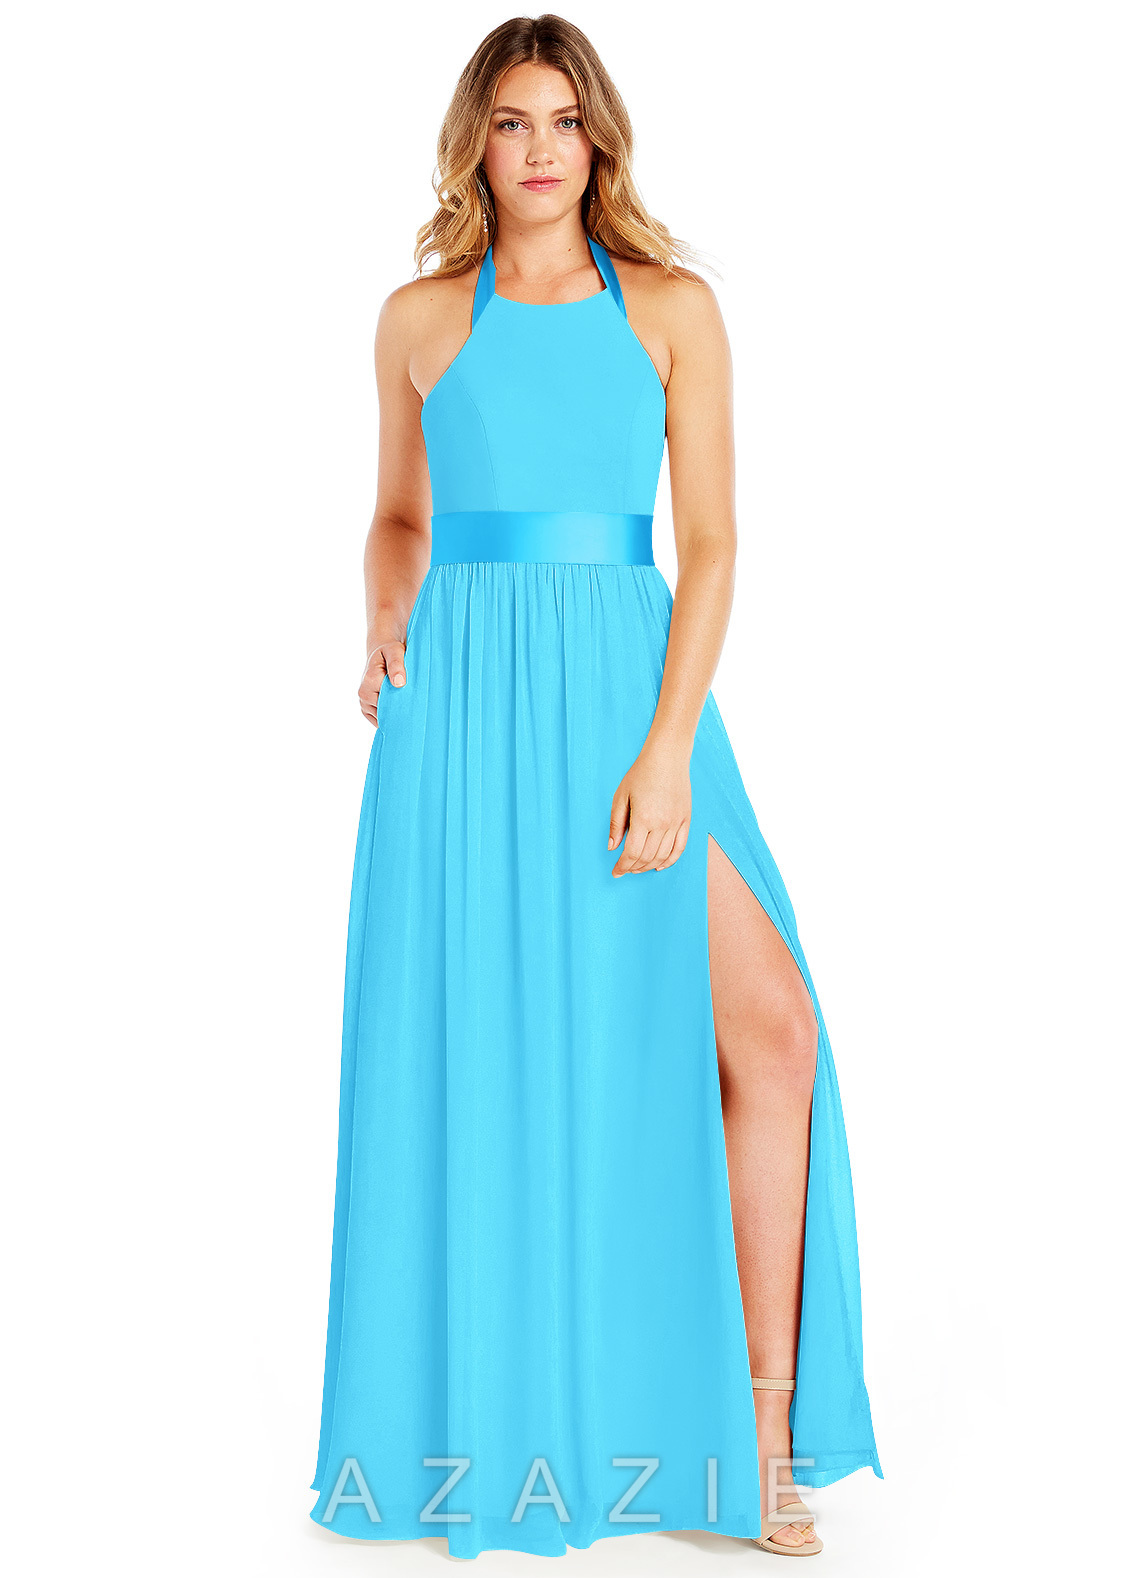 2d544aae8a4 Azazie Aurora Bridesmaid Dresses